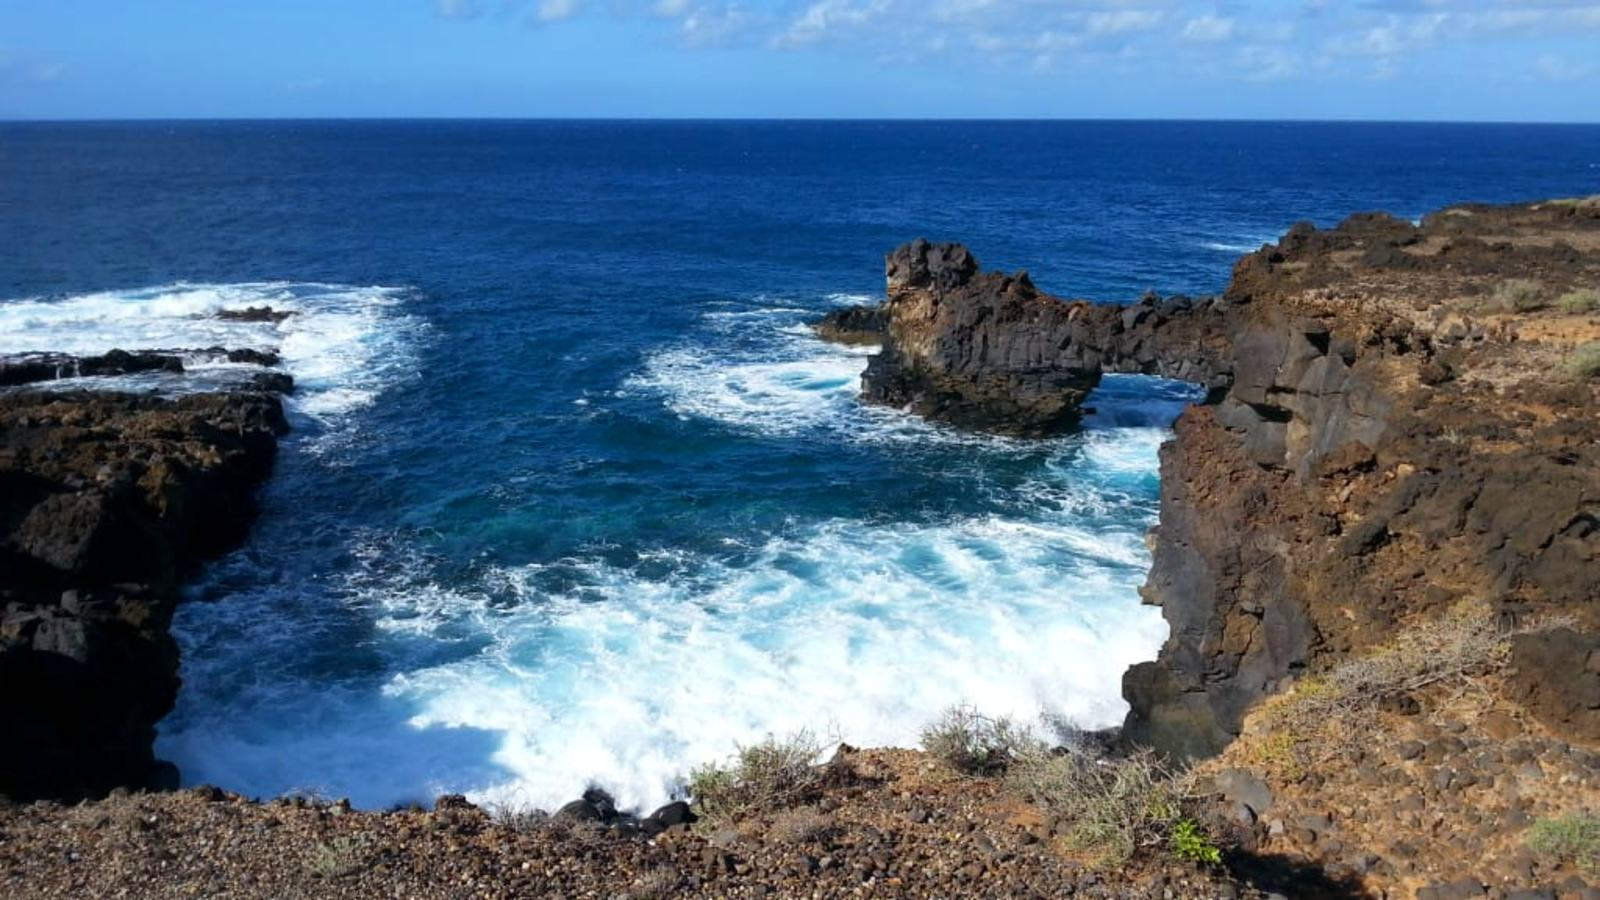 Litoral abrupto volcánico de Tenerife